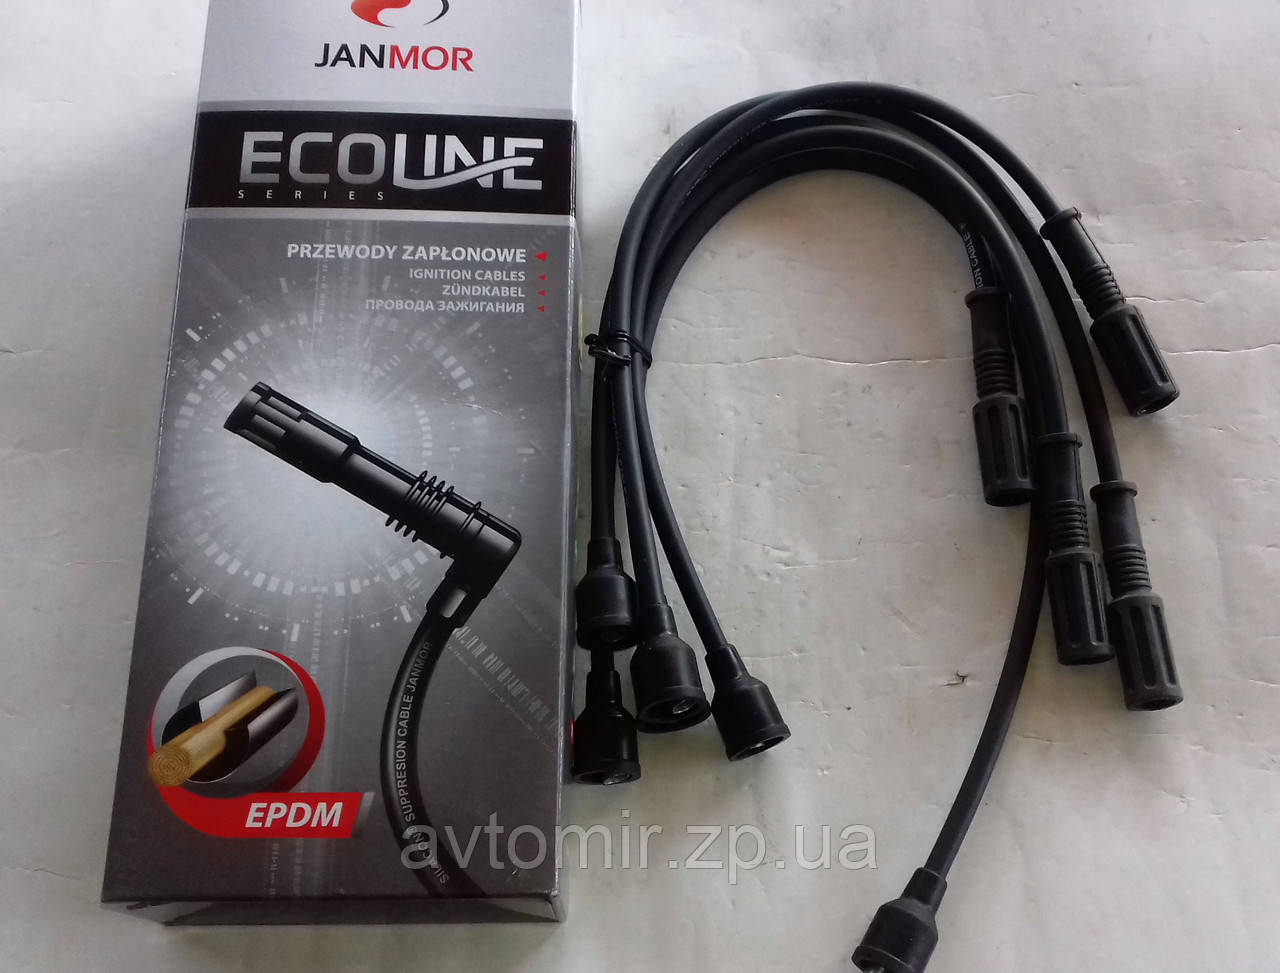 Провода свечные Ваз 2101-2107 Janmor